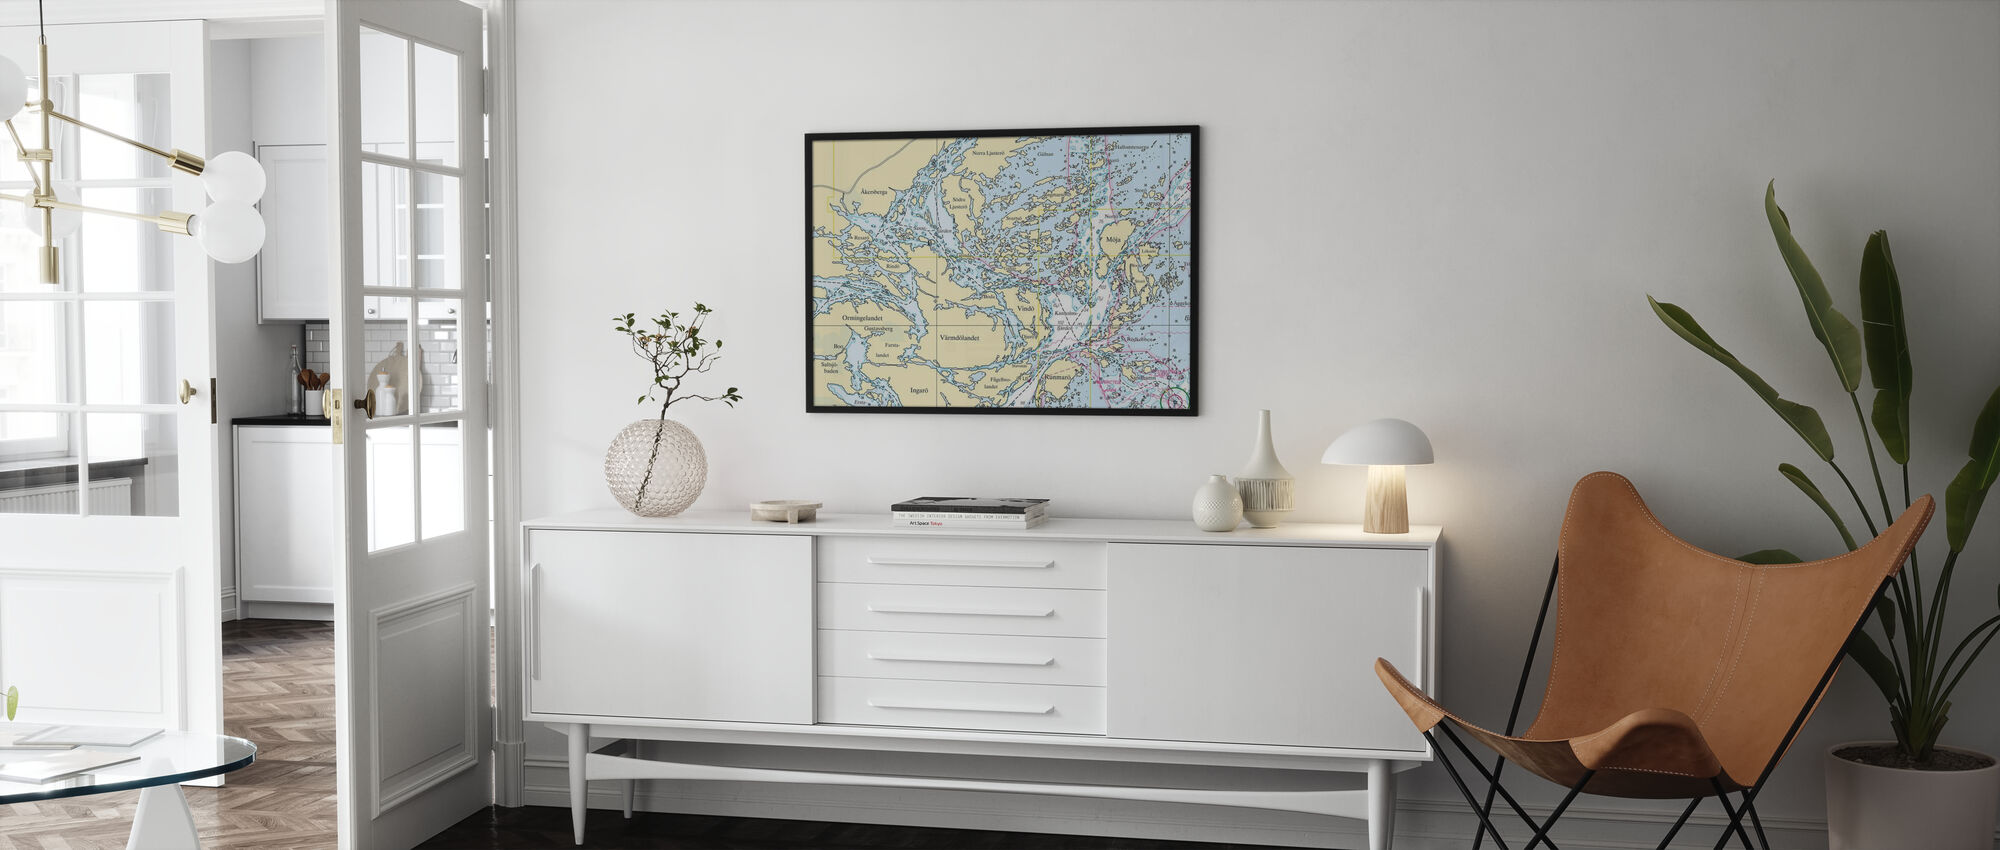 Midden-Archipel - Ingelijste print - Woonkamer